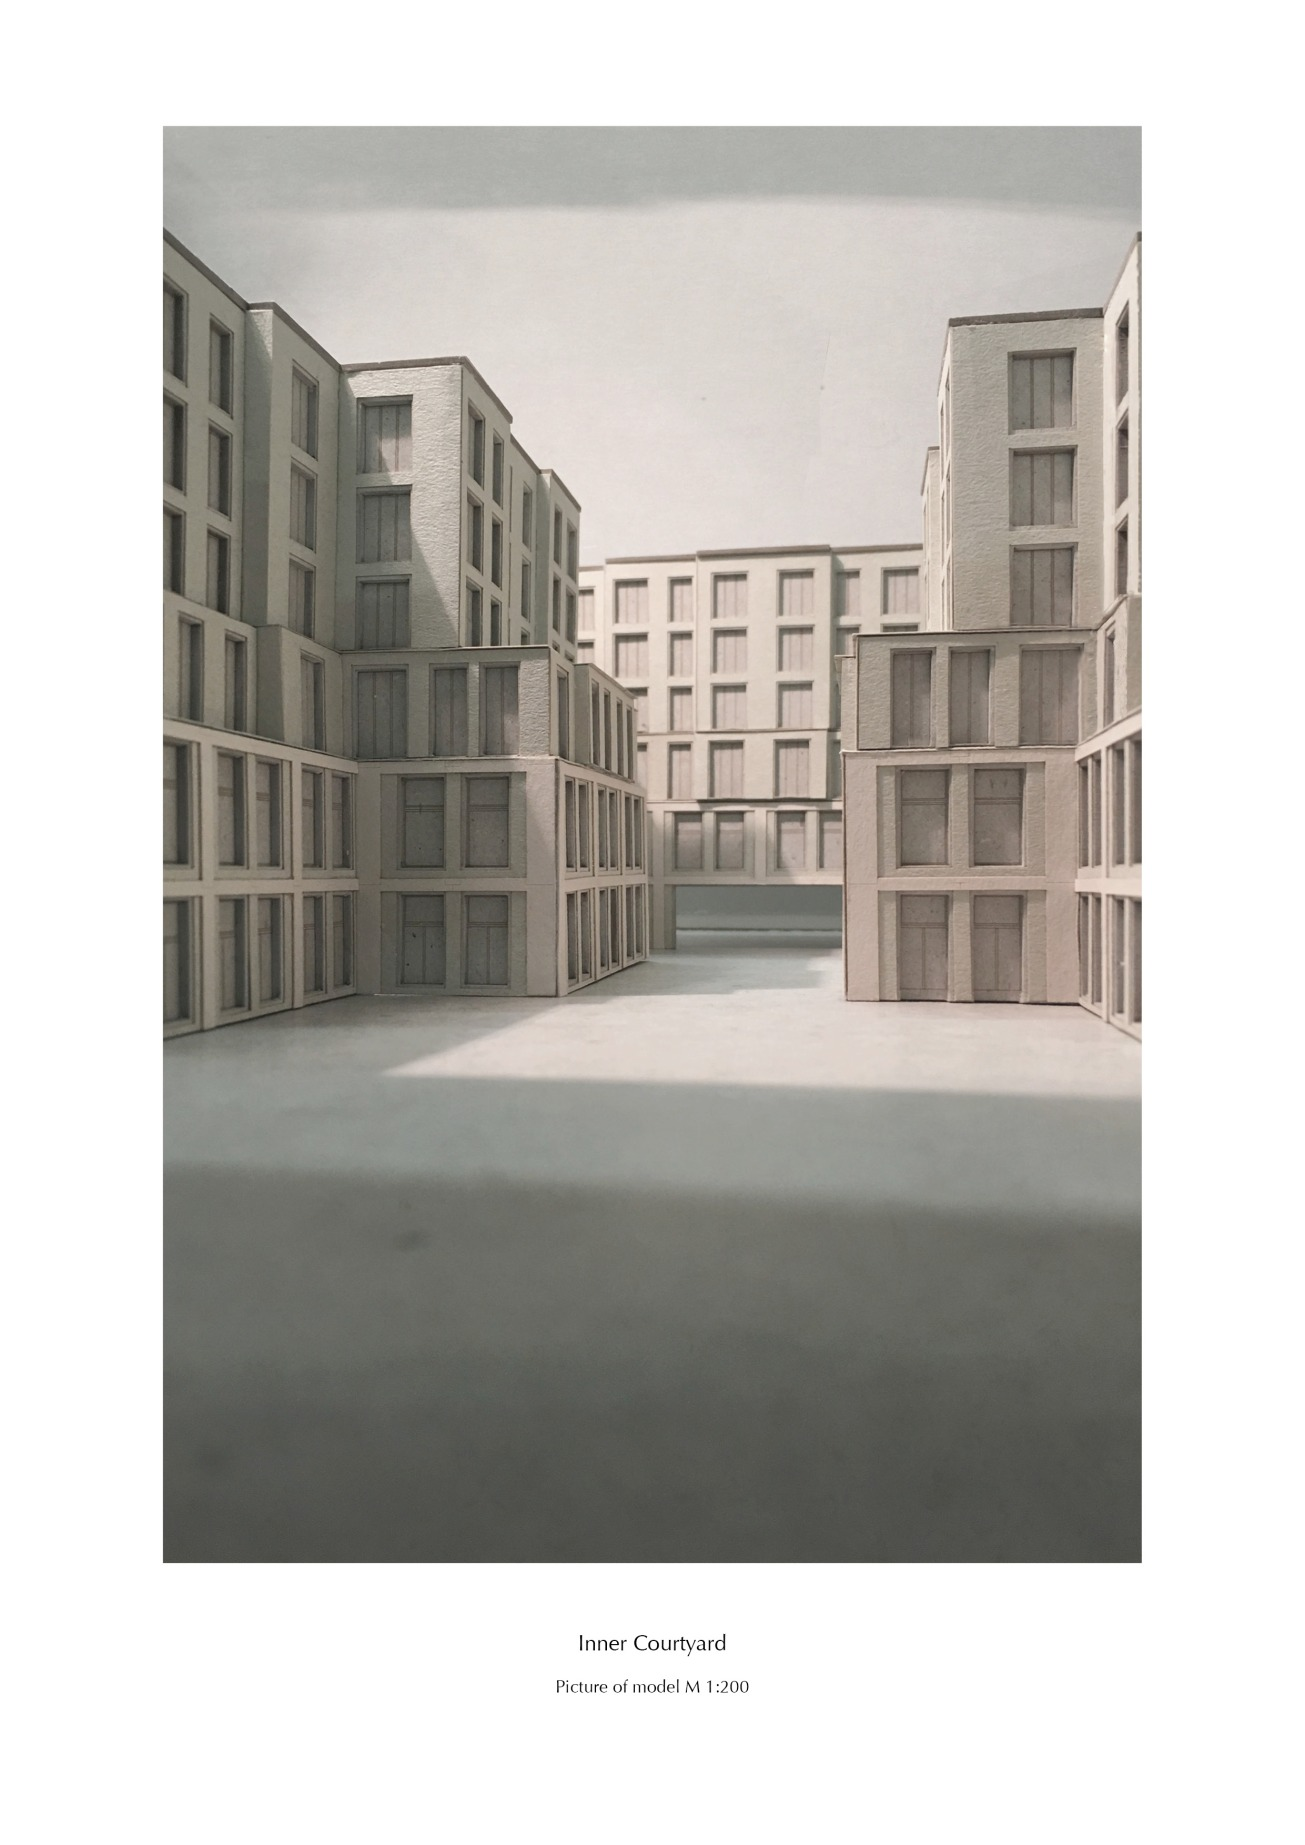 Megastructures -Reuse and Extension Karstadt Munich, Lena Teresa Kohl, Master Thesis, (2016, Technical University of Munich) 14